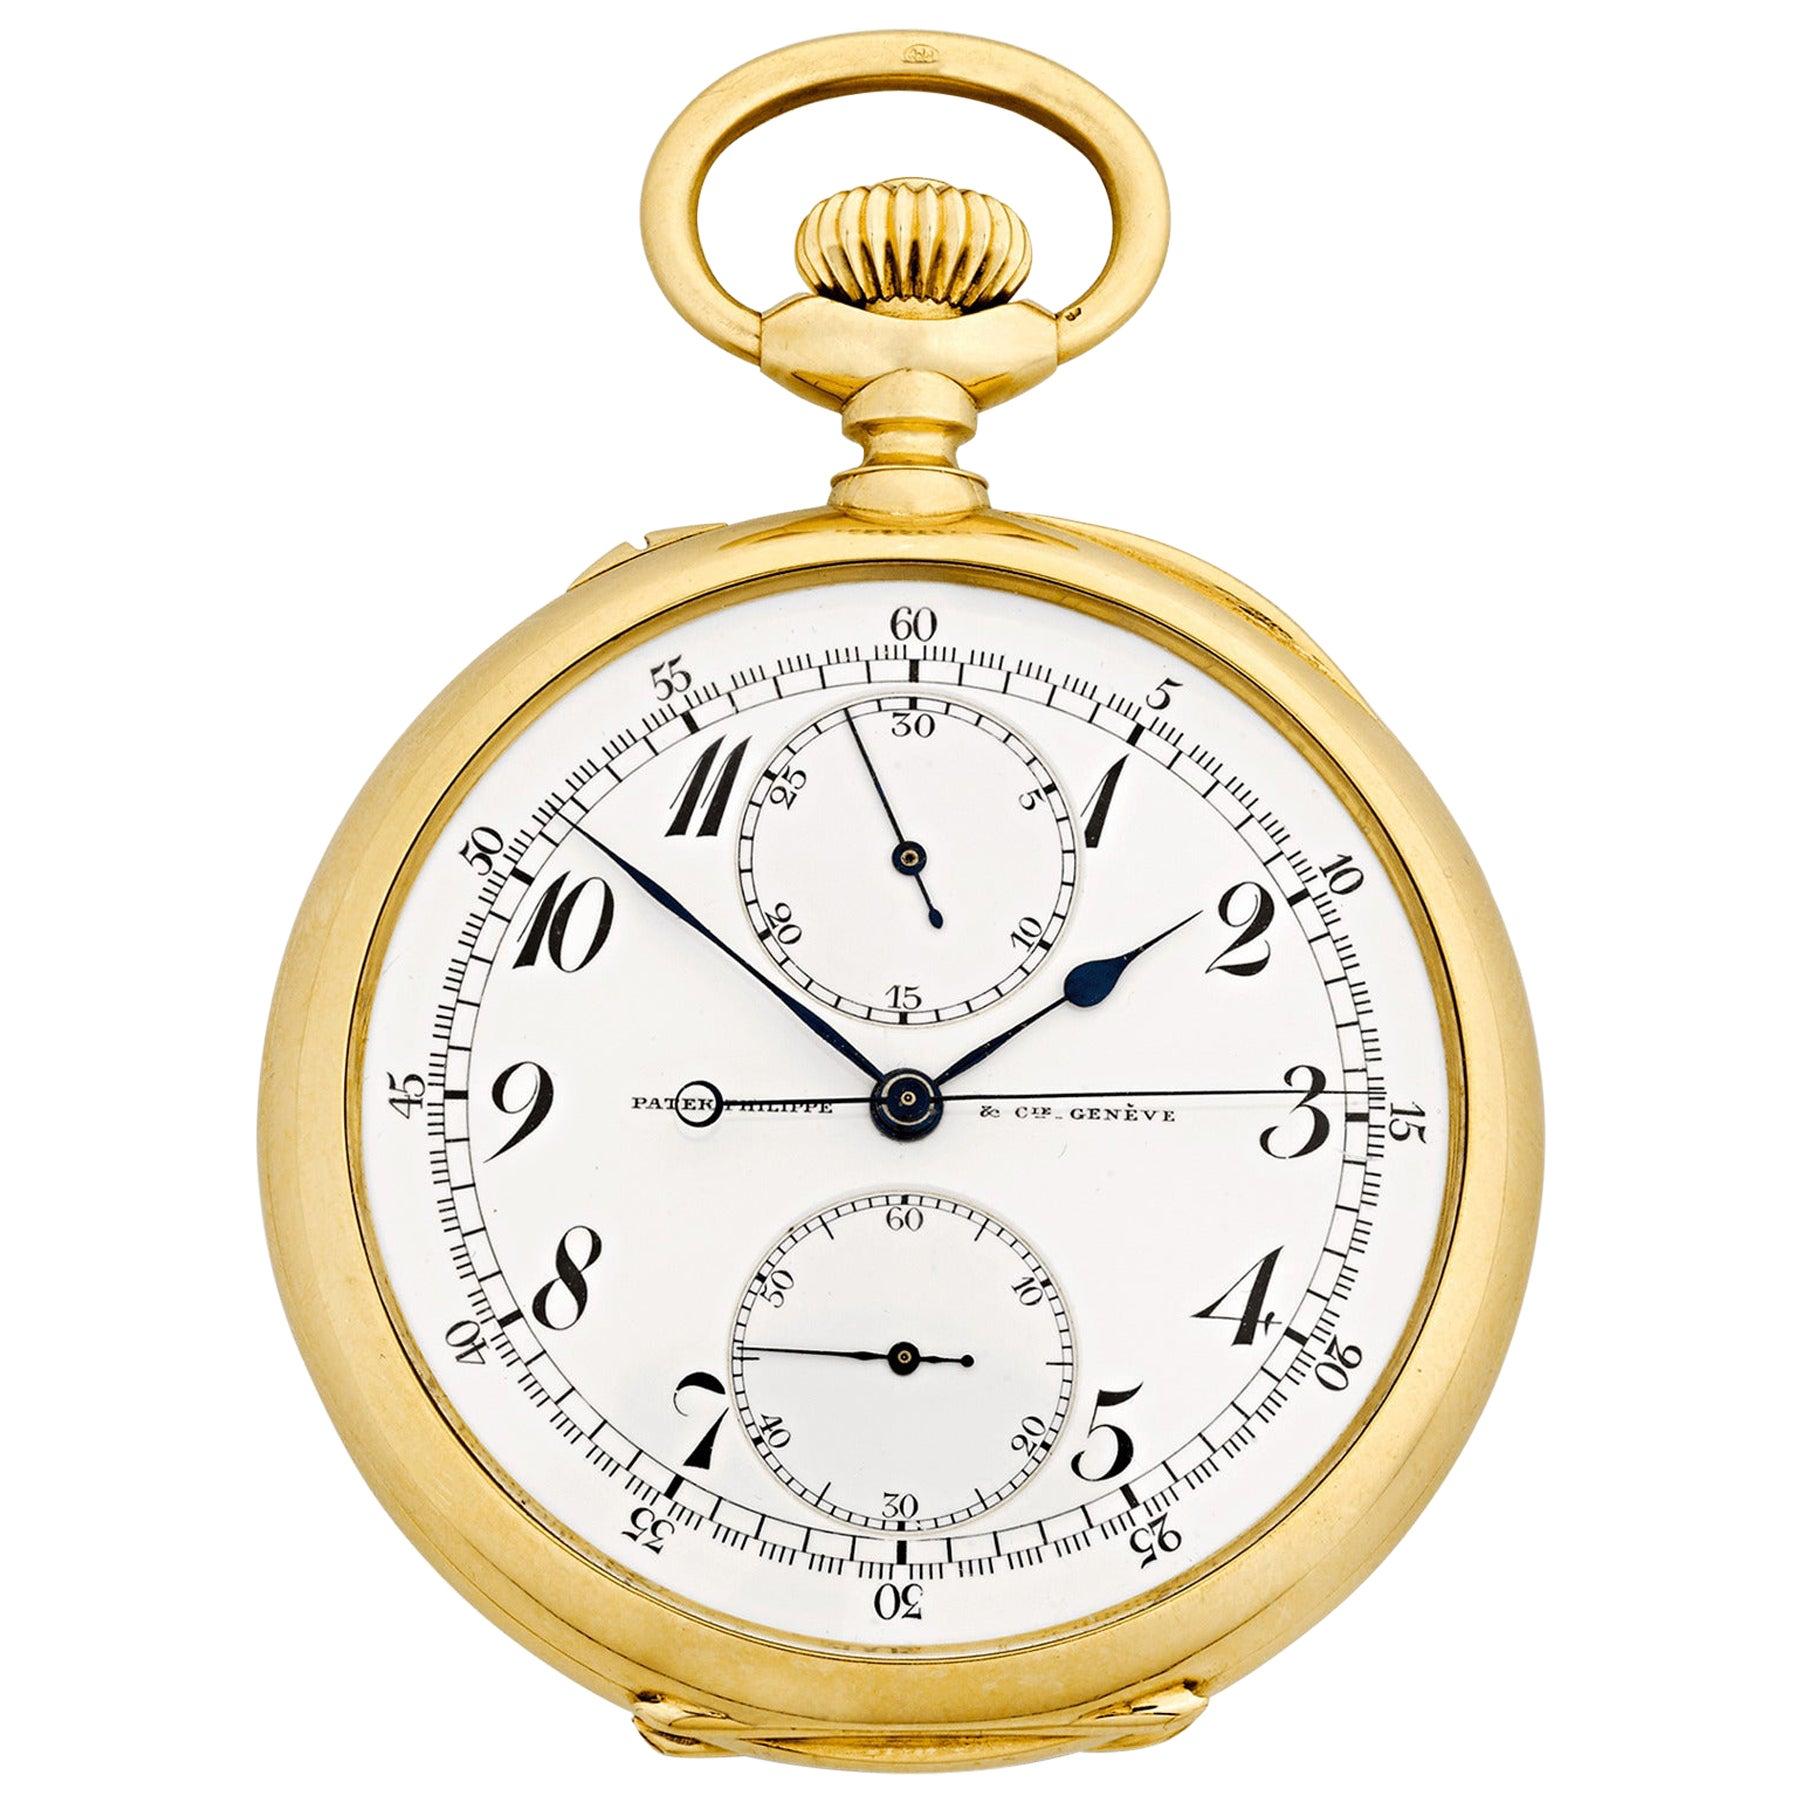 Patek Philippe Chronograph Pocket Watch